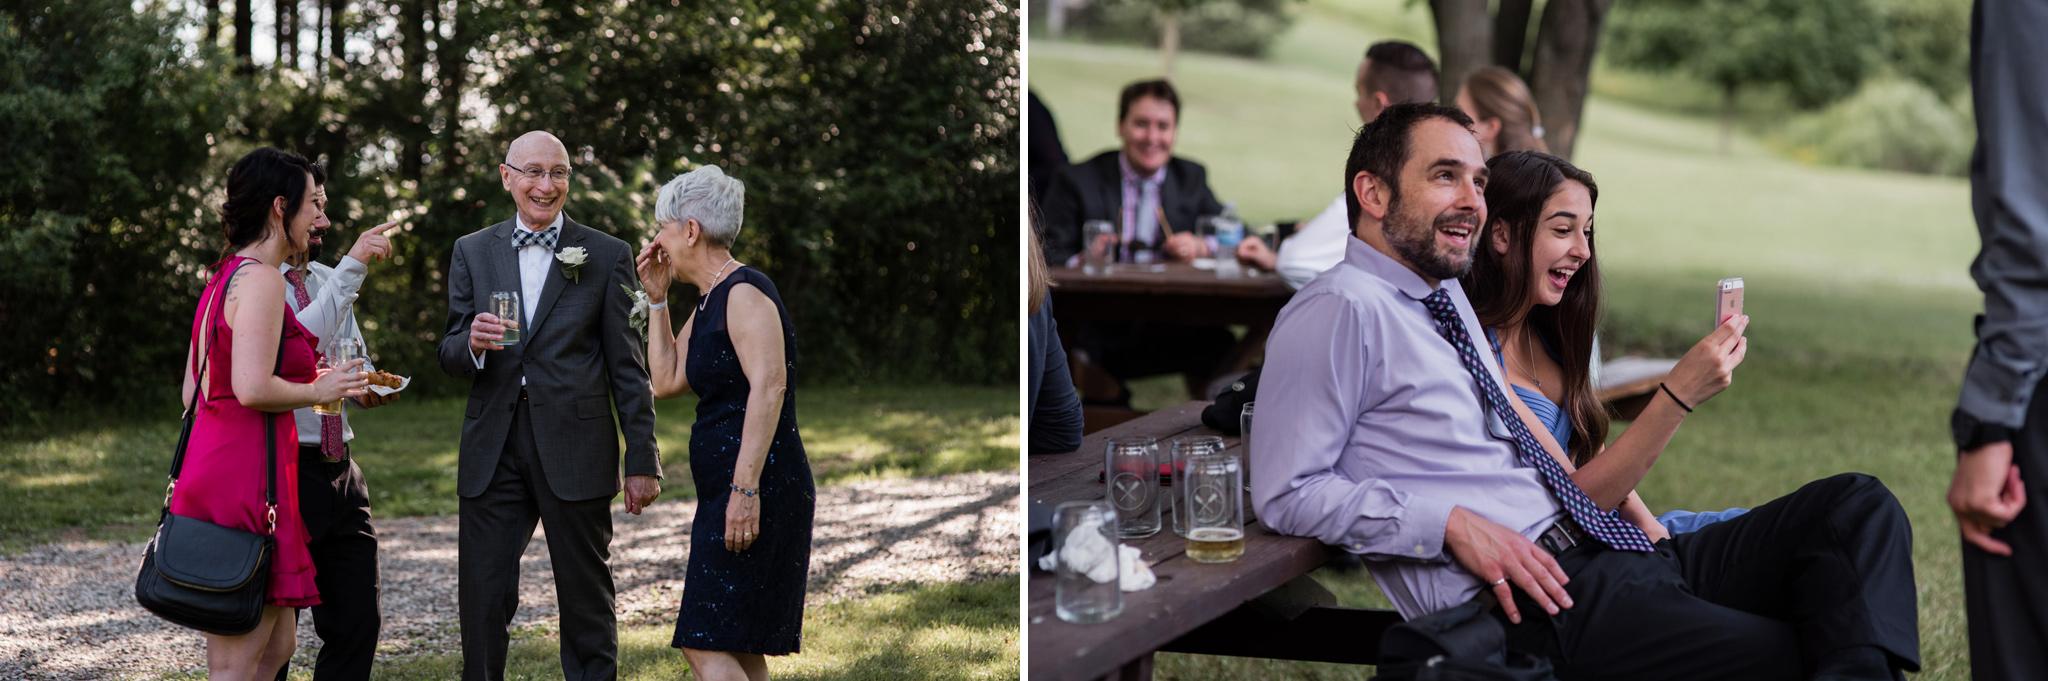 117-sydenham-ridge-wedding-barn-reception-toronto-photographer.jpg